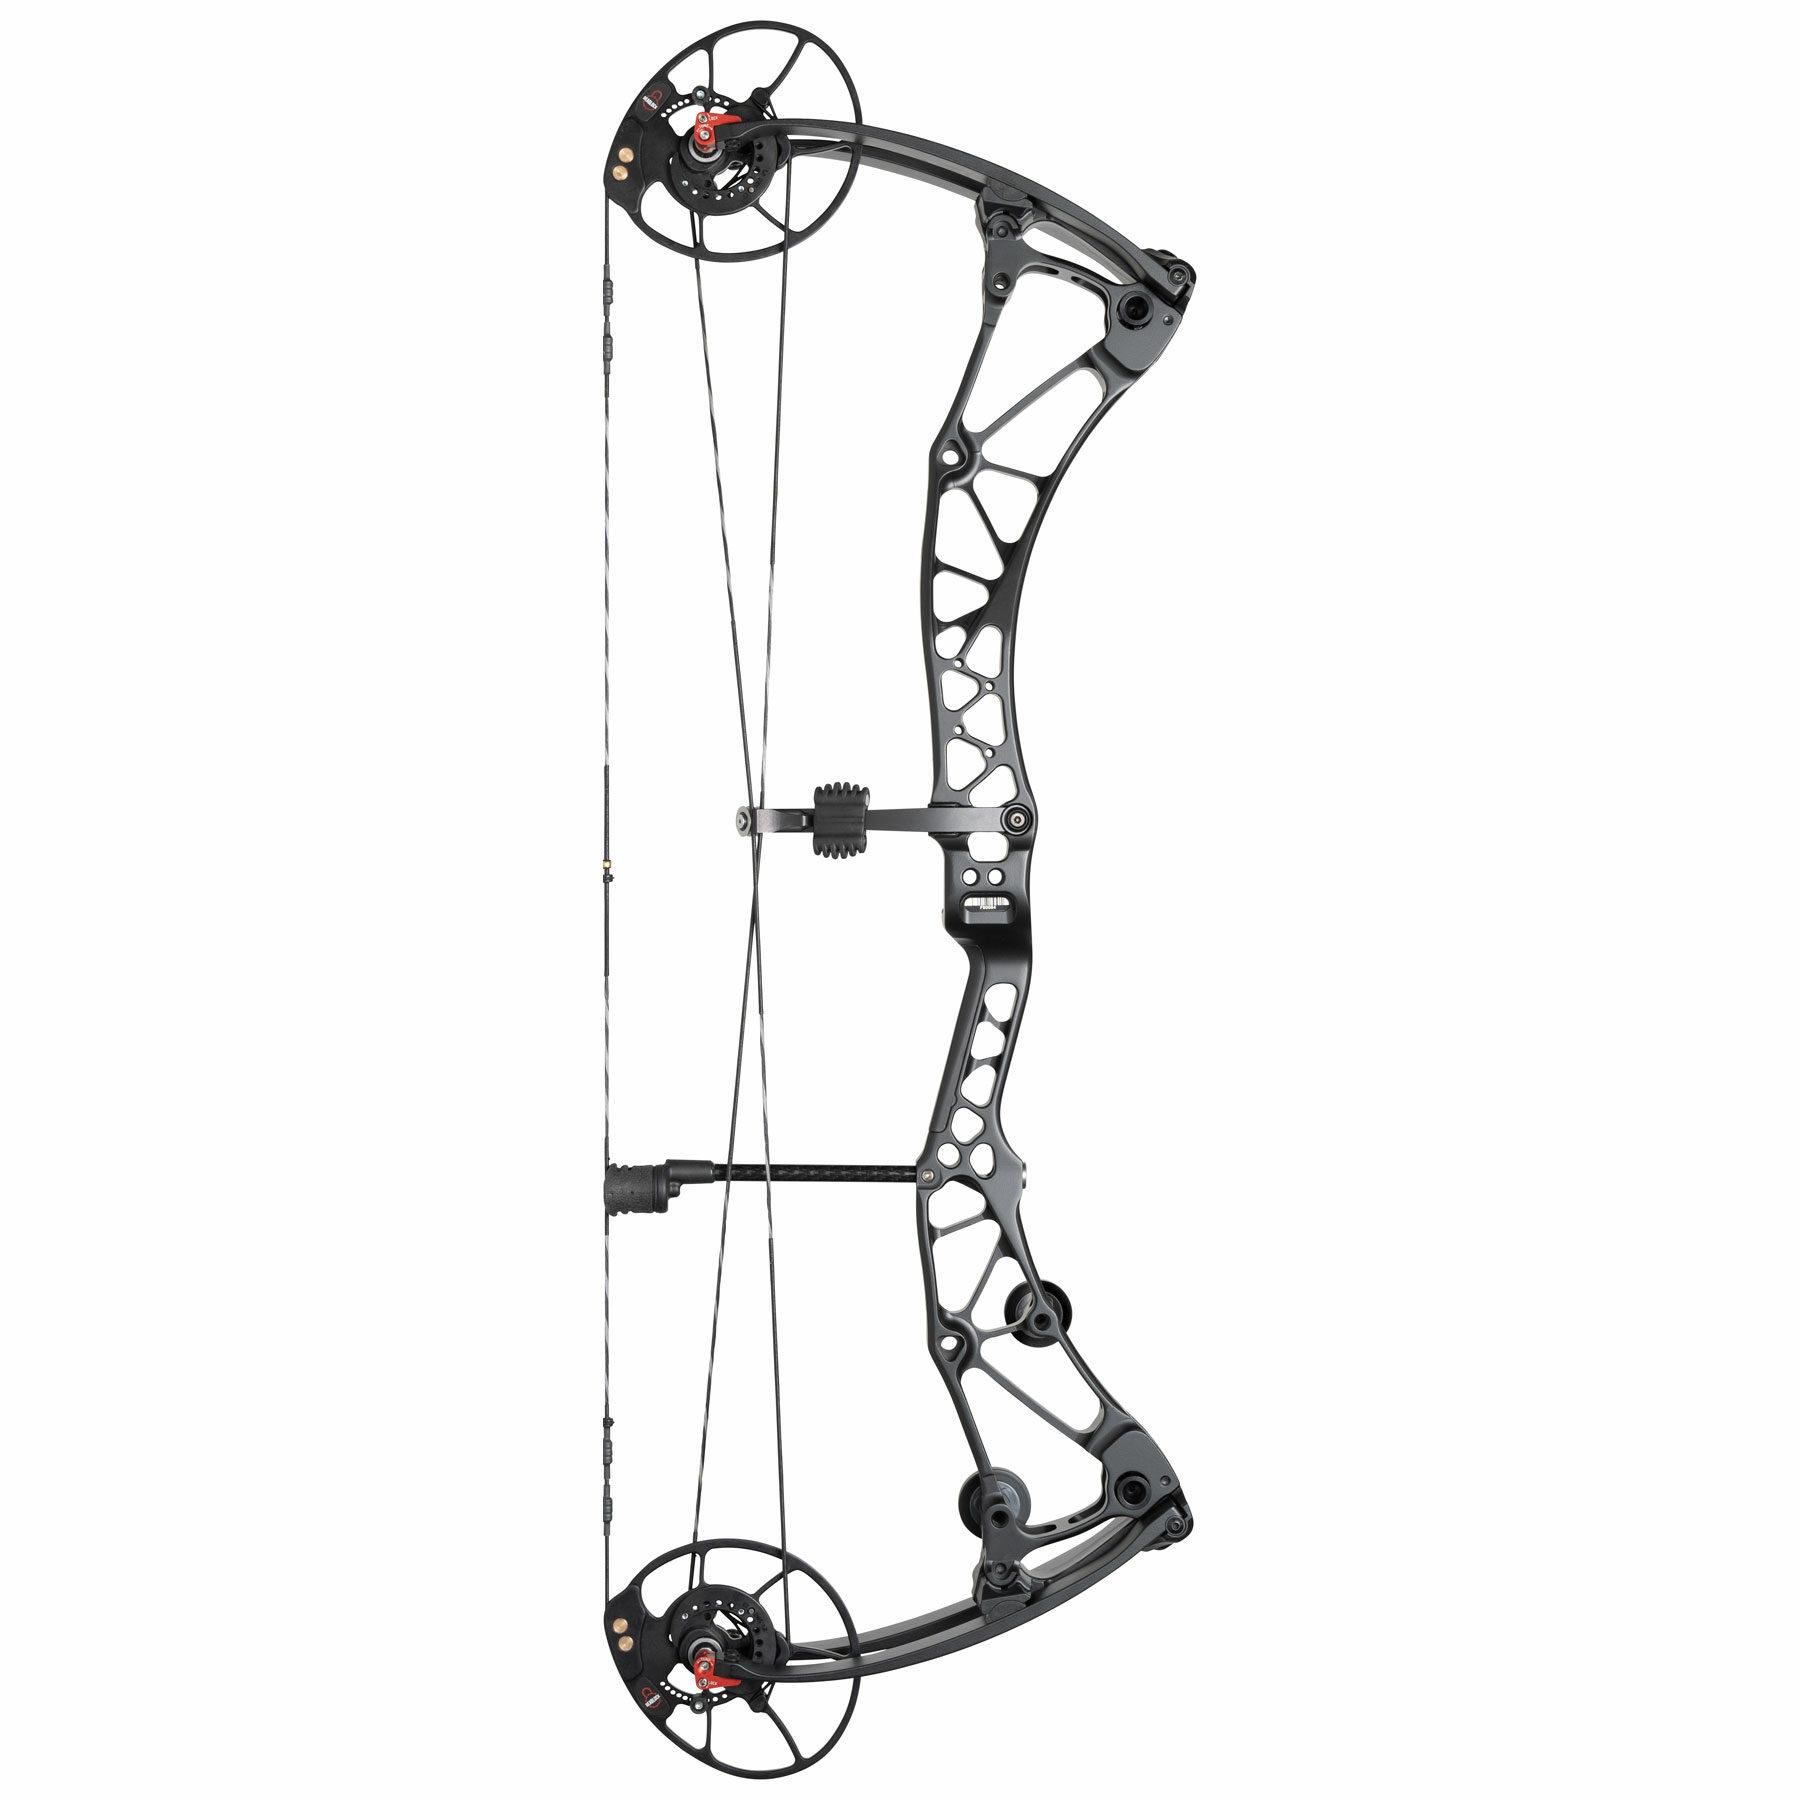 Revolt black archery compound bow